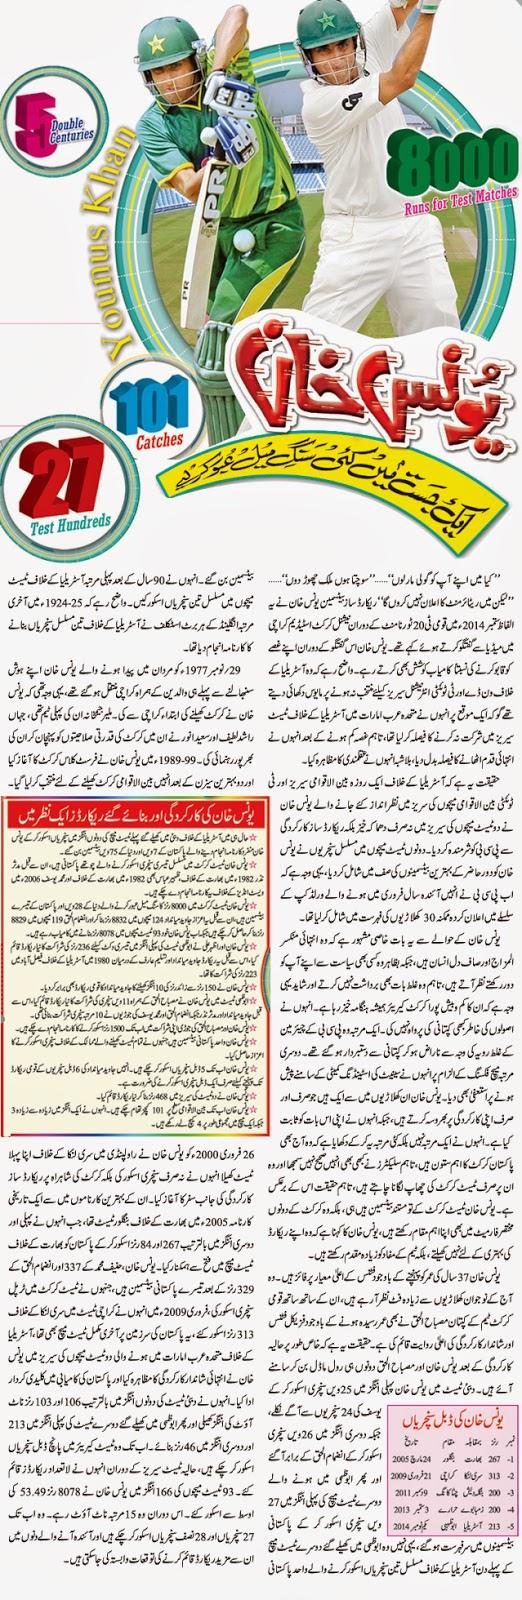 Younus Khan Cricketer Biography in Urdu